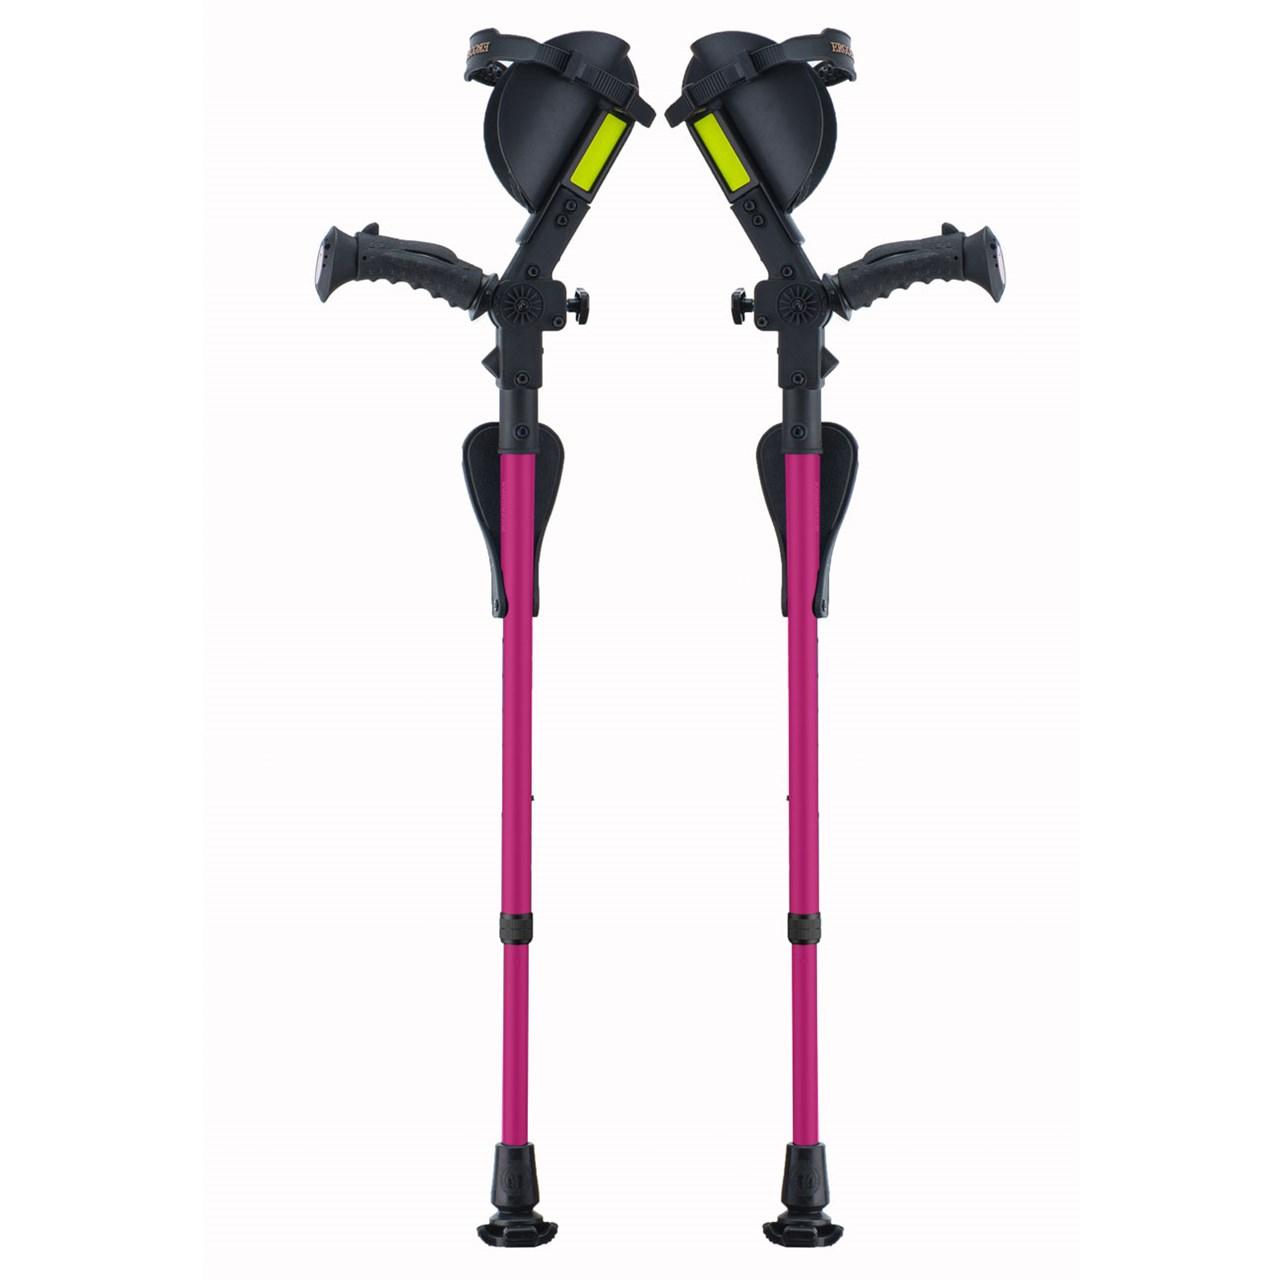 Ergobaum Junior Ergonomic Forearm Crutches - Juvenile - Pink